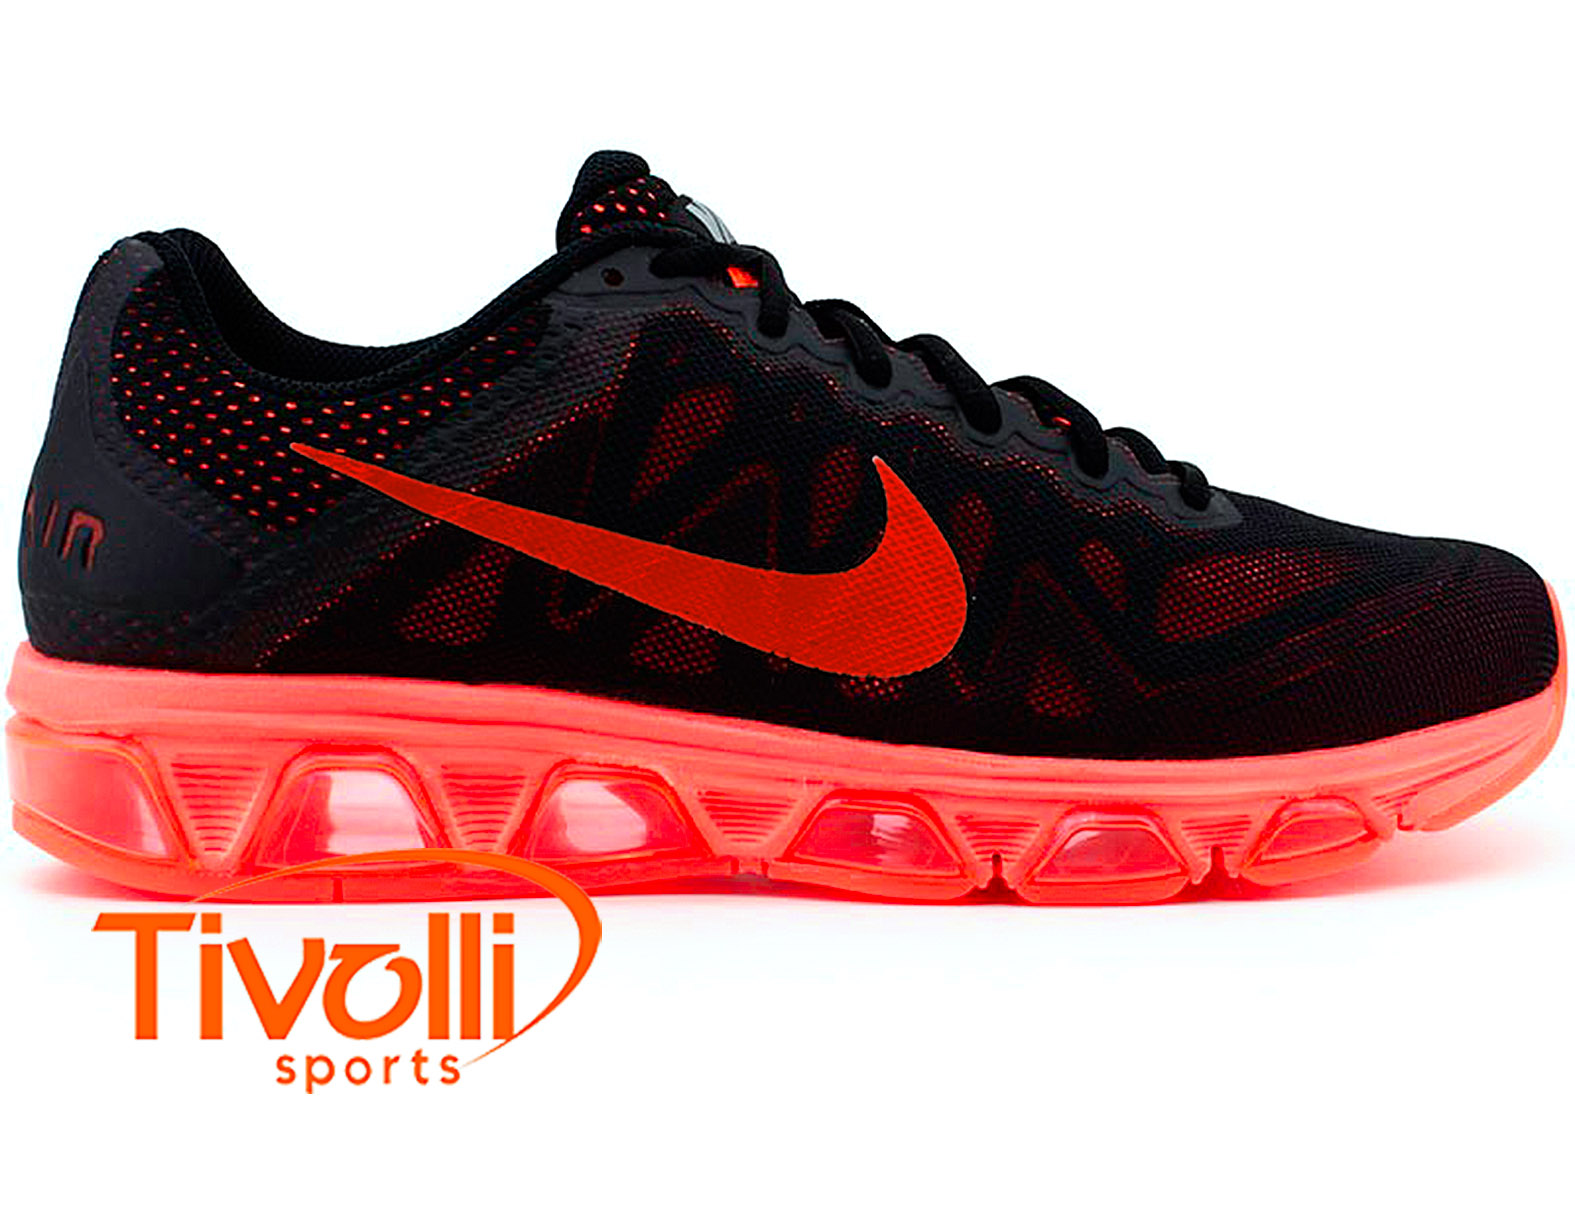 Tênis Nike Air Max Tailwind 7 Preto e Coral